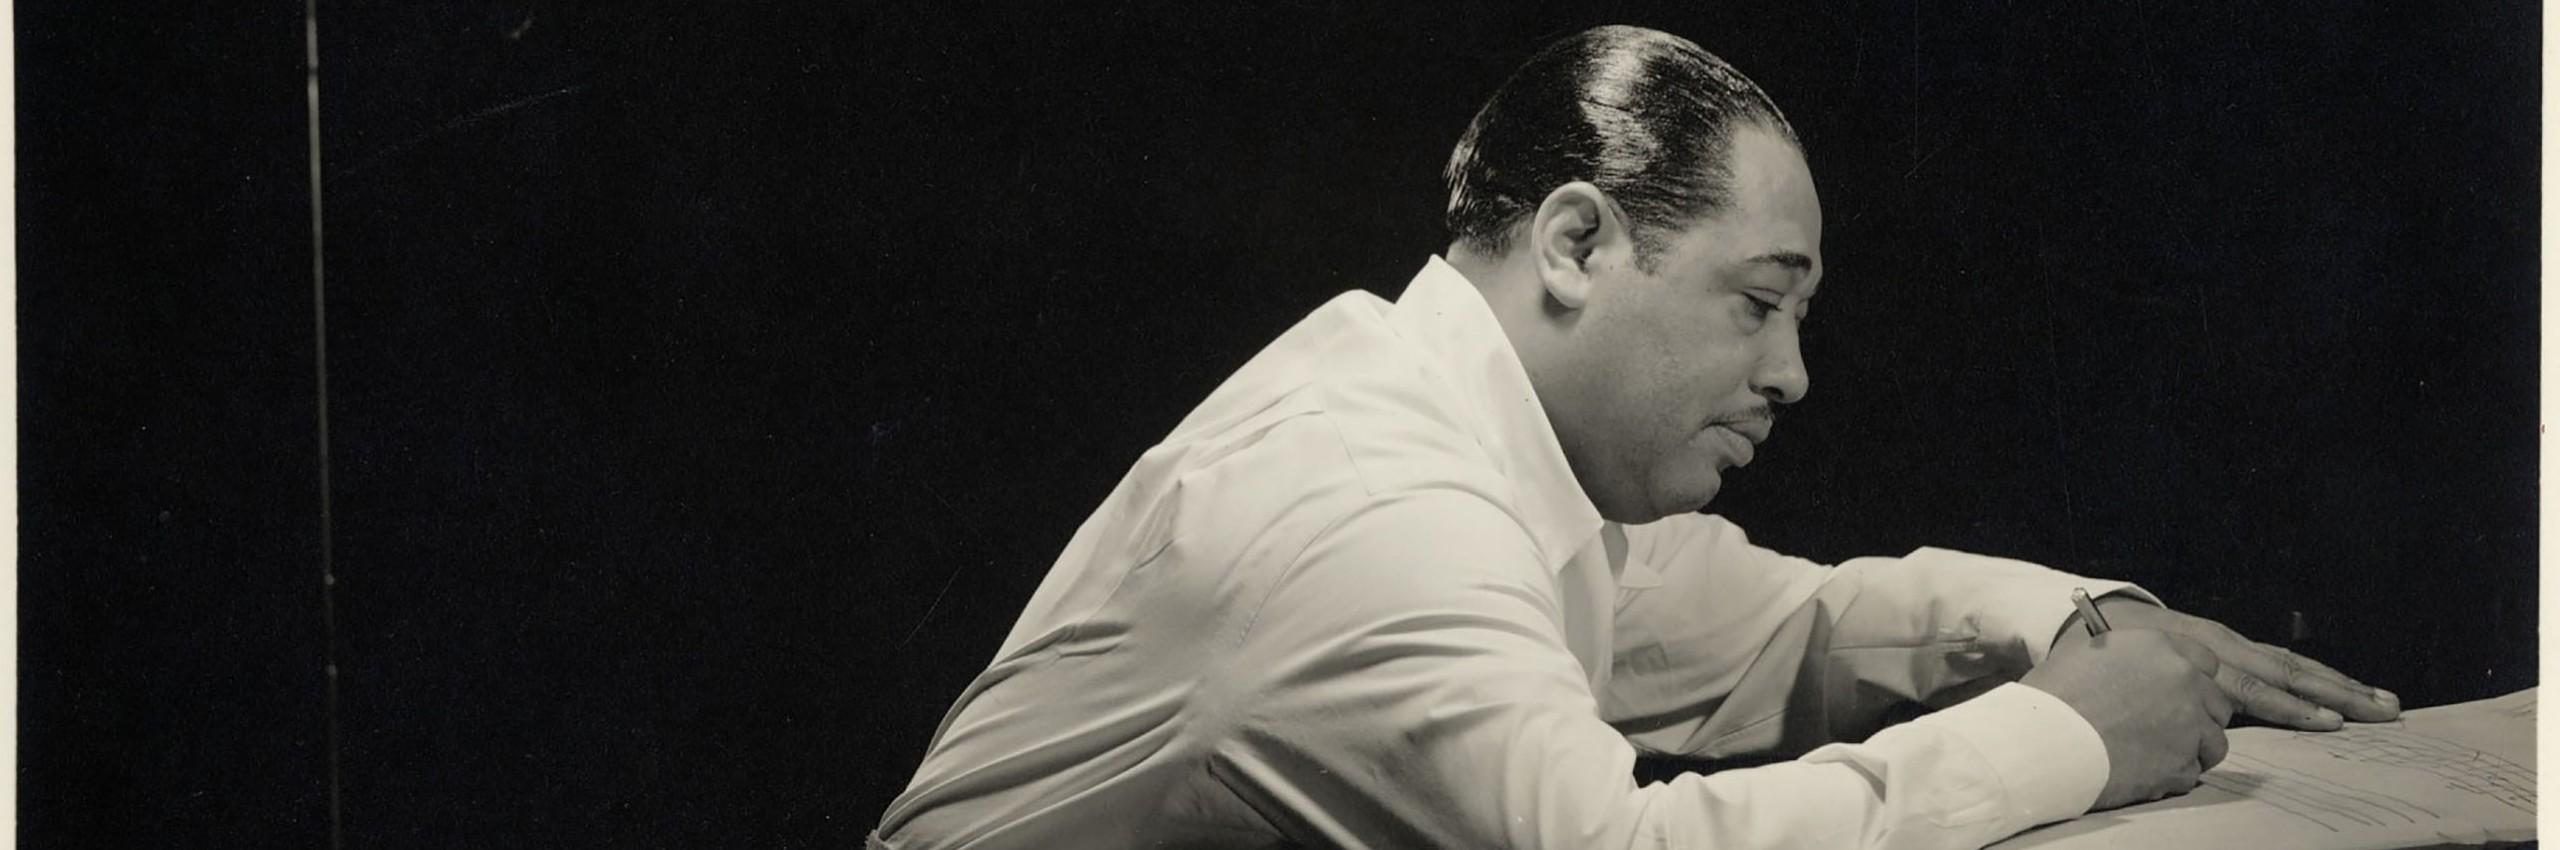 Duke Ellington composing at a piano